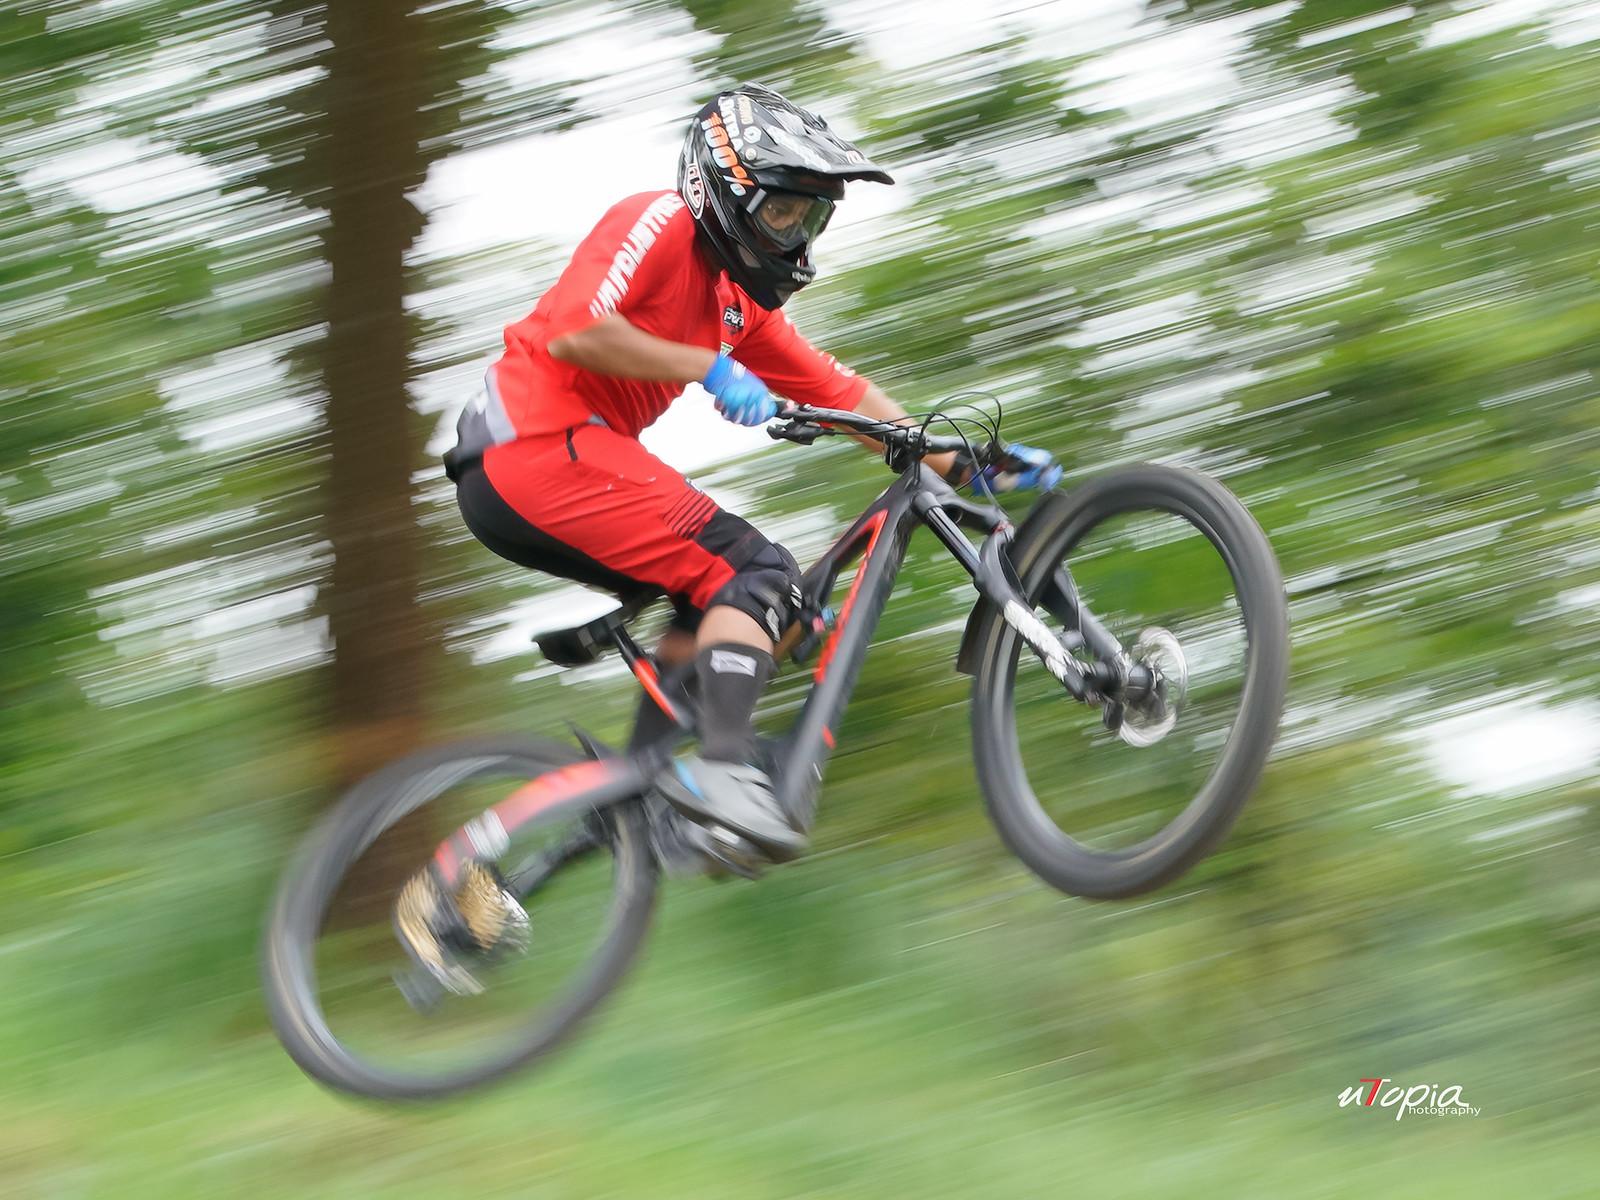 Take off Ditra - utopiaarch - Mountain Biking Pictures - Vital MTB